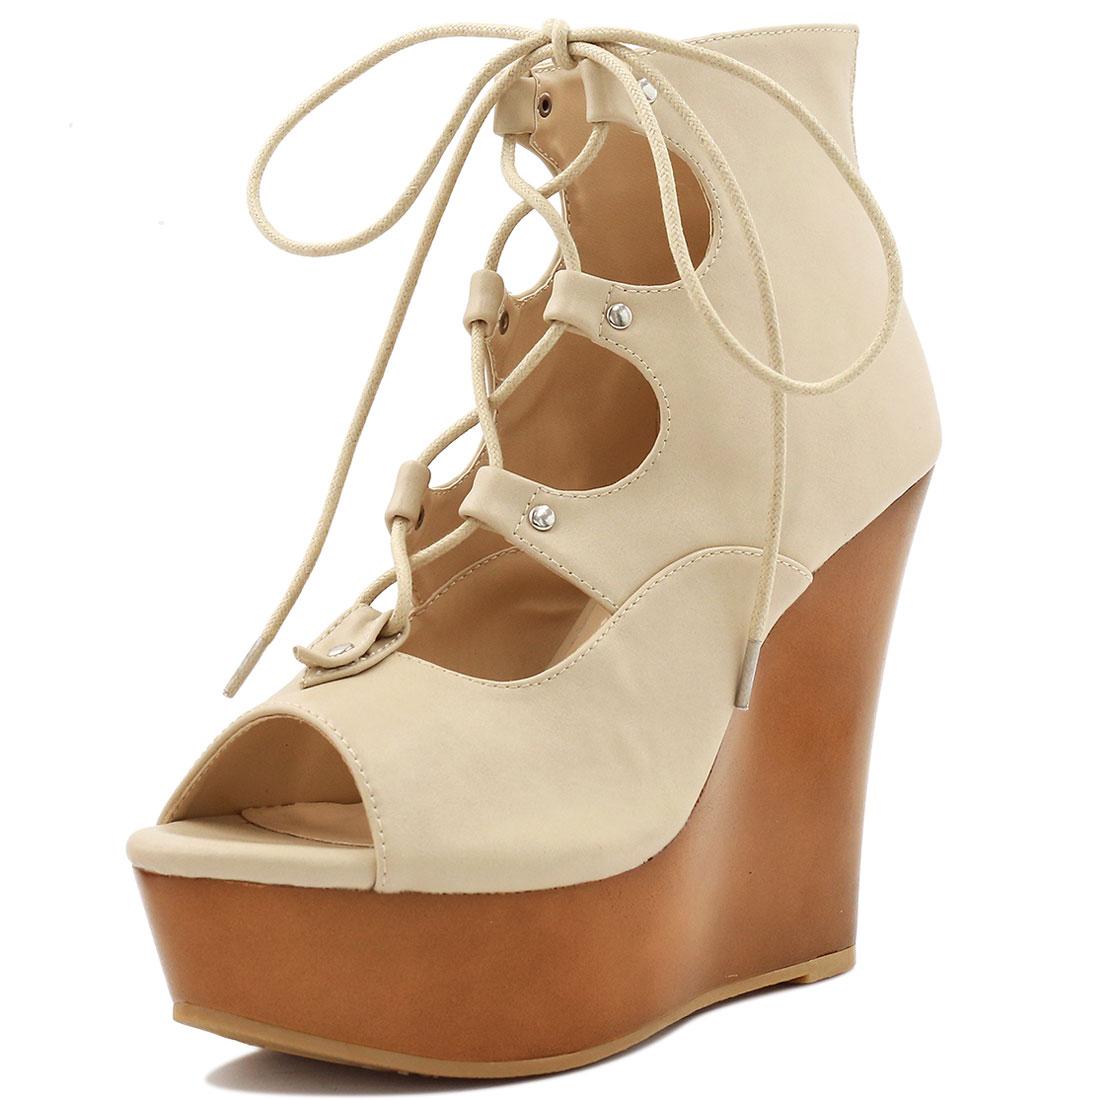 Woman Peep Toe Lace-Up Cutout Platform Wedge Sandals Beige US 6